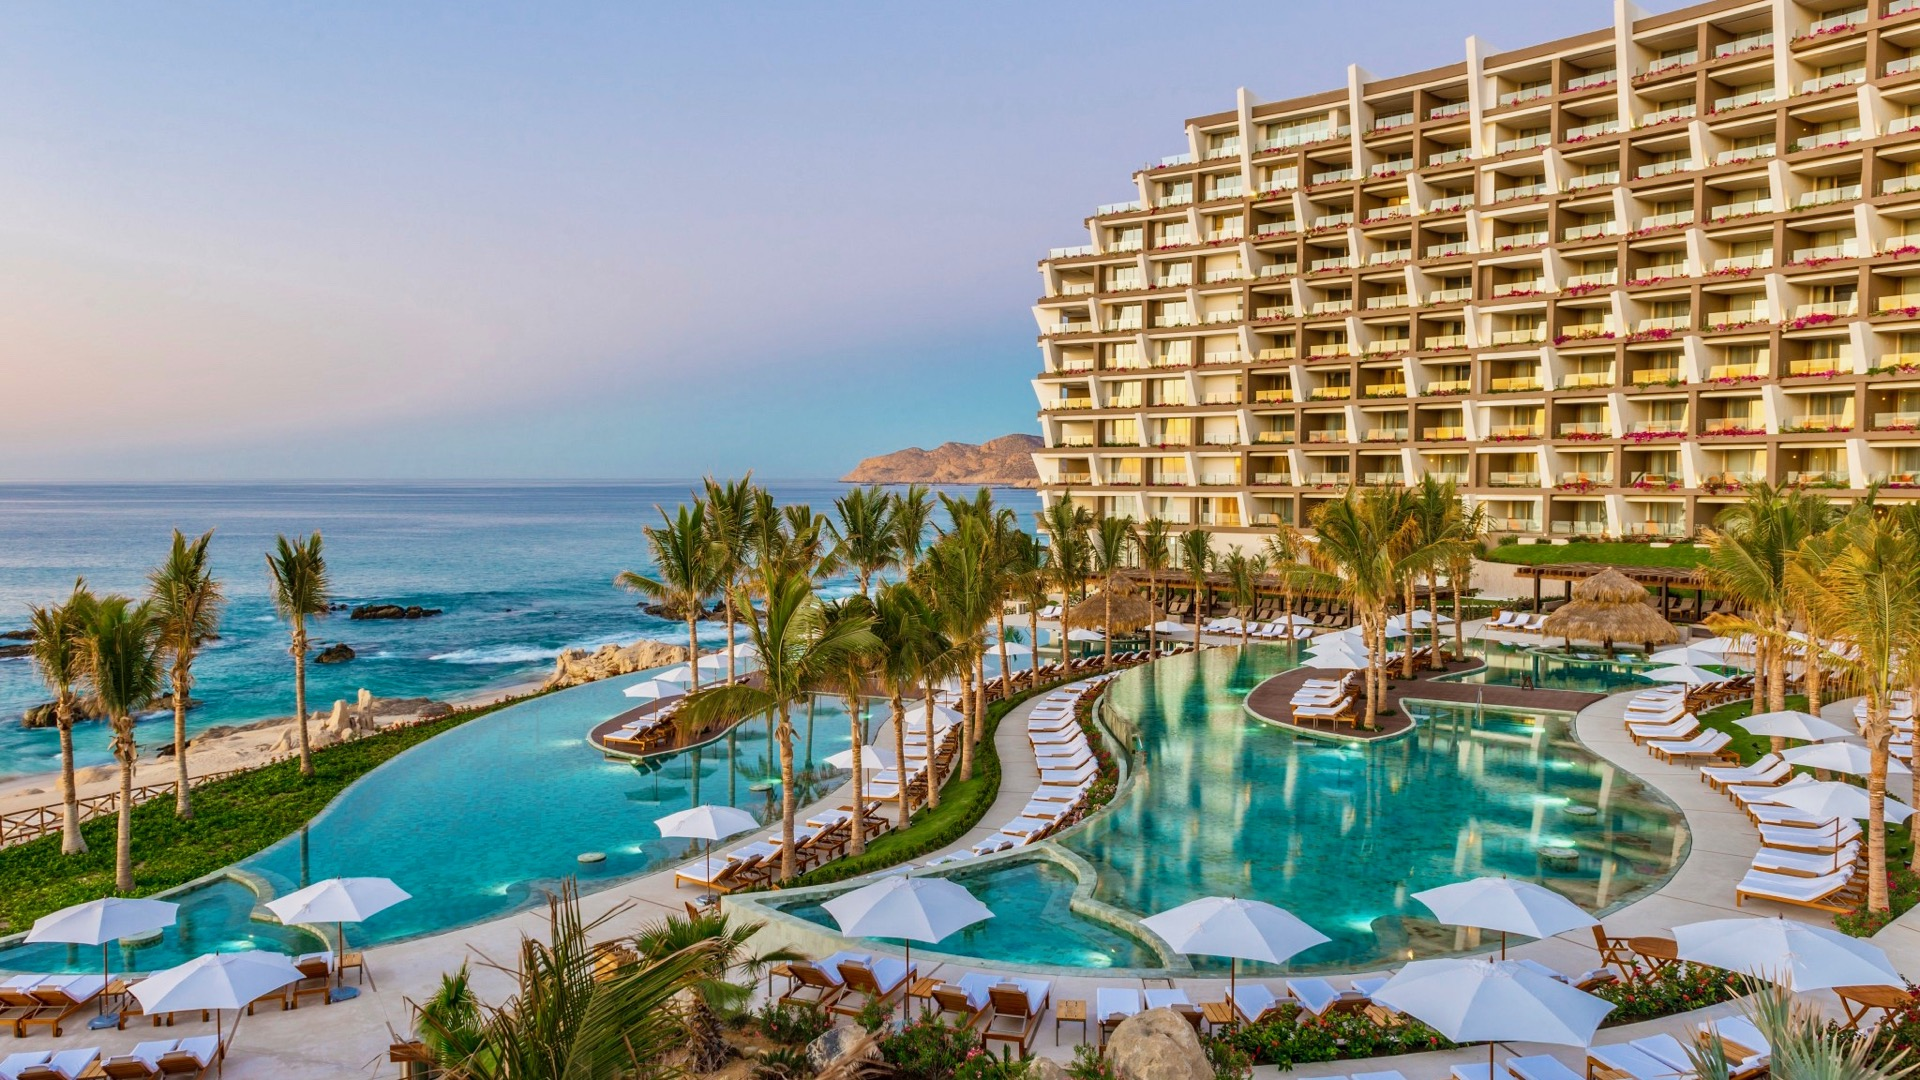 Grand Velas Los Cabo, Wellness Suites, Healthy Living + Travel